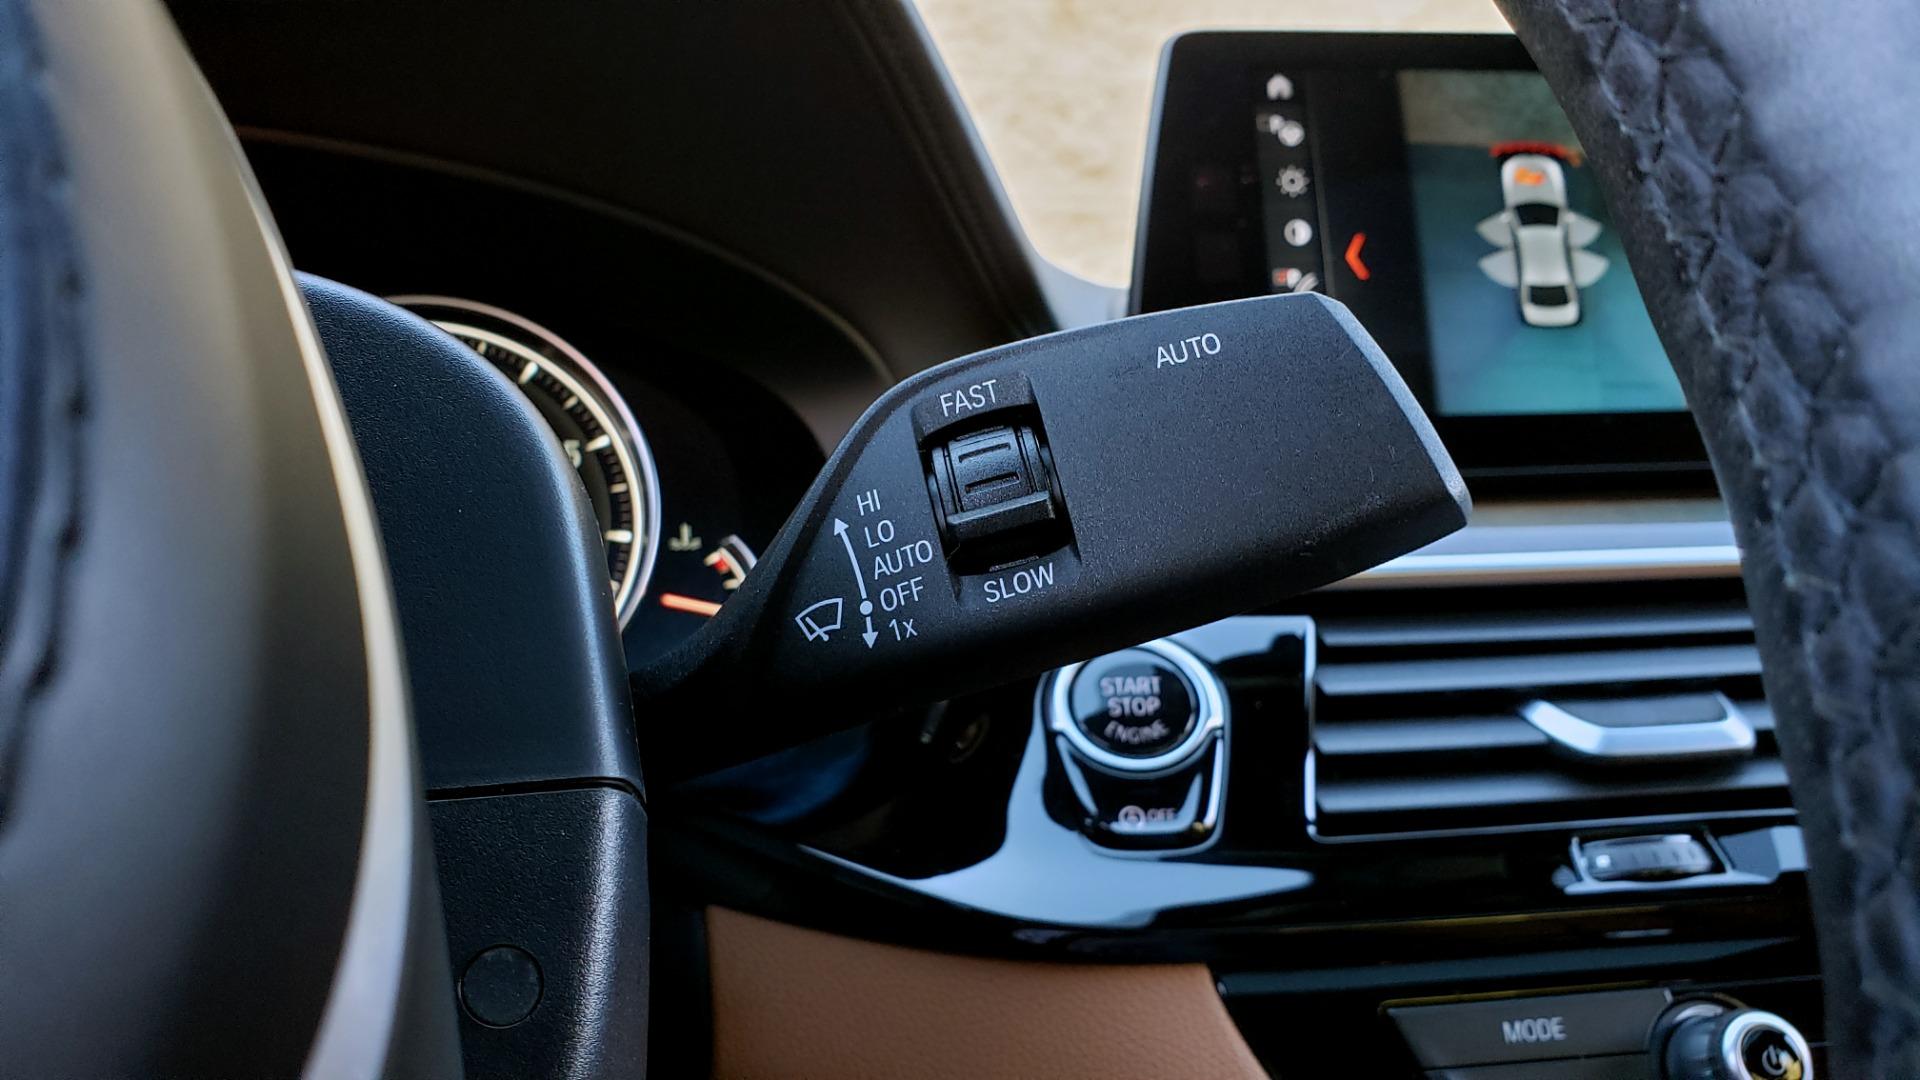 Used 2018 BMW 5 SERIES 540I M-SPORT / DRVR ASST / EXEC PKG / NAV / SUNROOF / HUD / REARVIEW for sale Sold at Formula Imports in Charlotte NC 28227 44